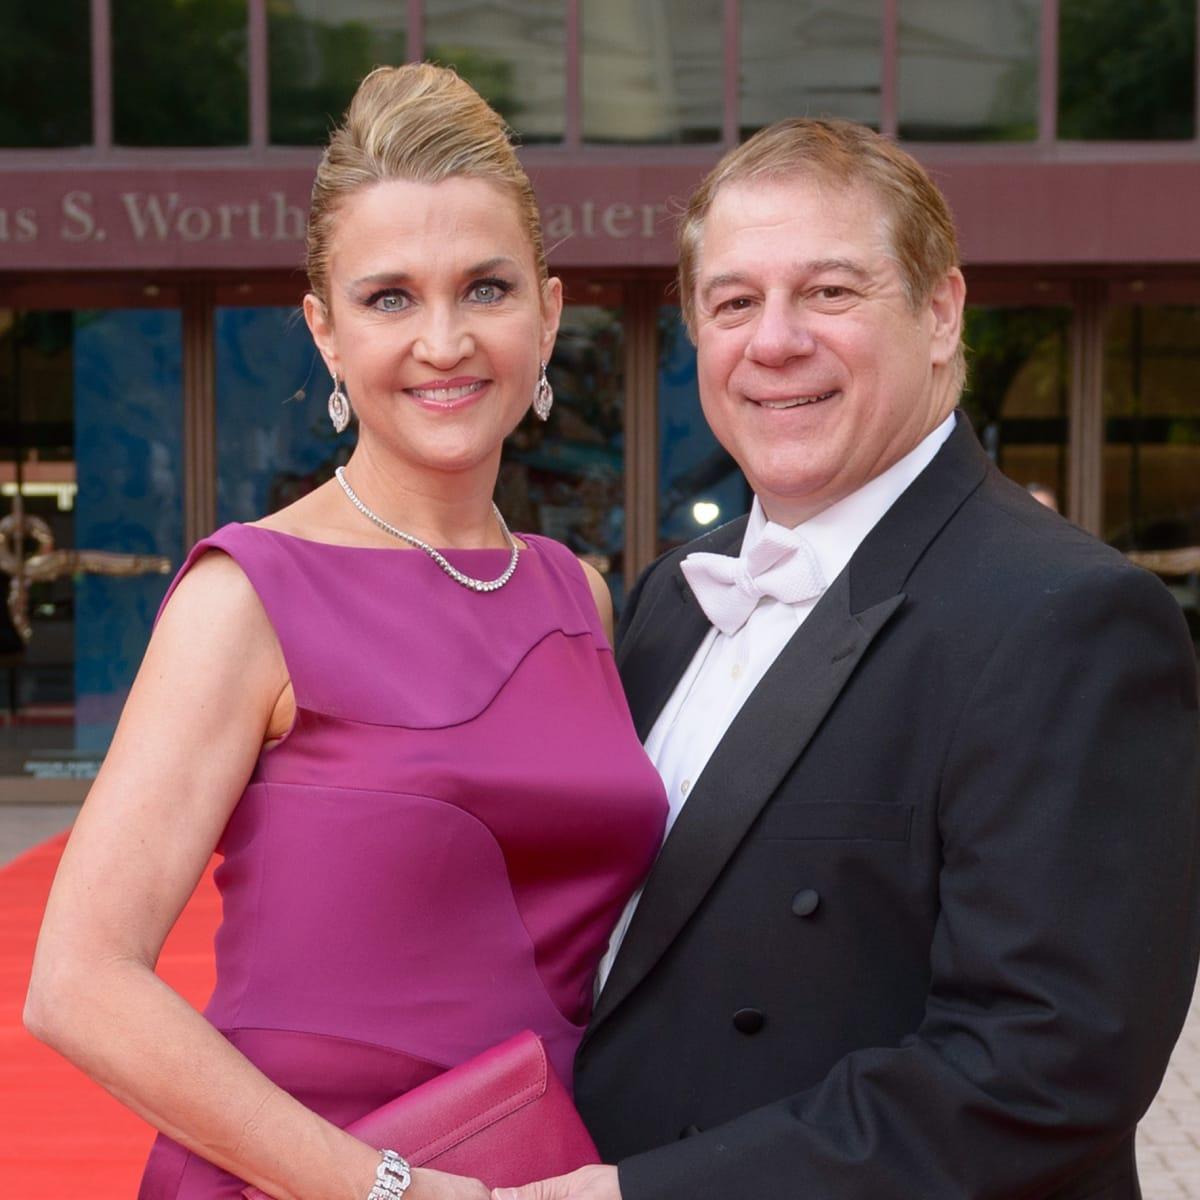 Houston Grand Opera Ball, April 2016, Mary D'Andrea, Dr. Mark D'Andrea